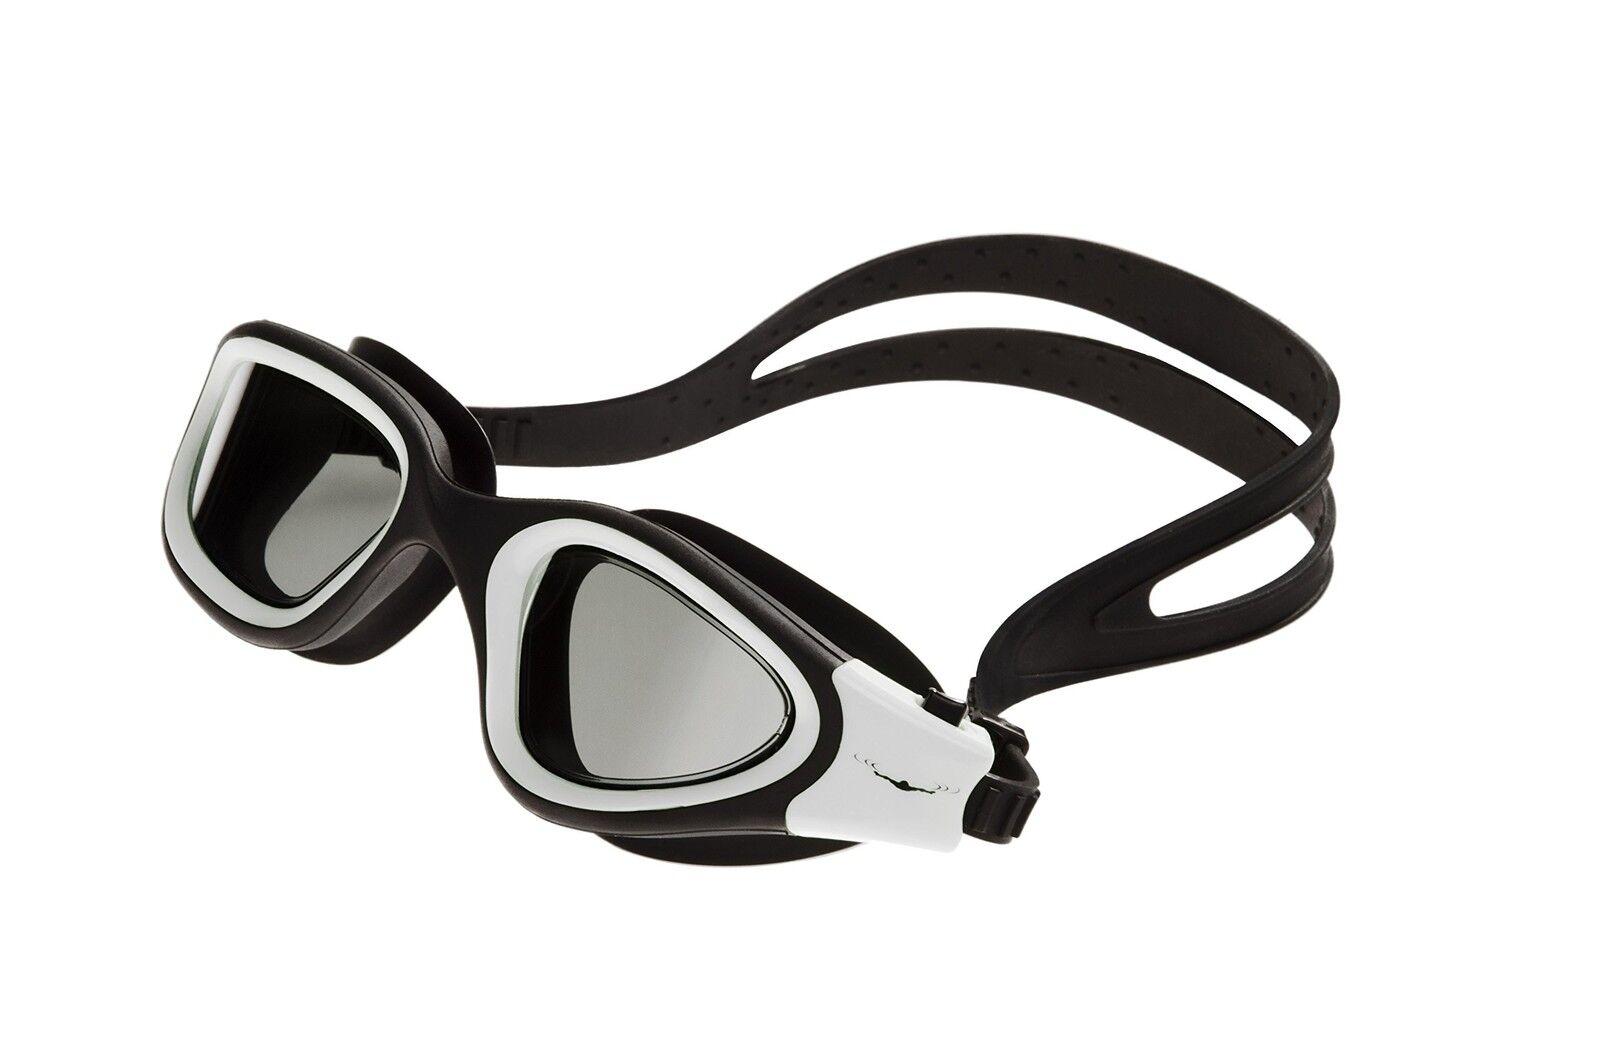 AqtivAqua Protective Case for Swim Goggles and Eyewear